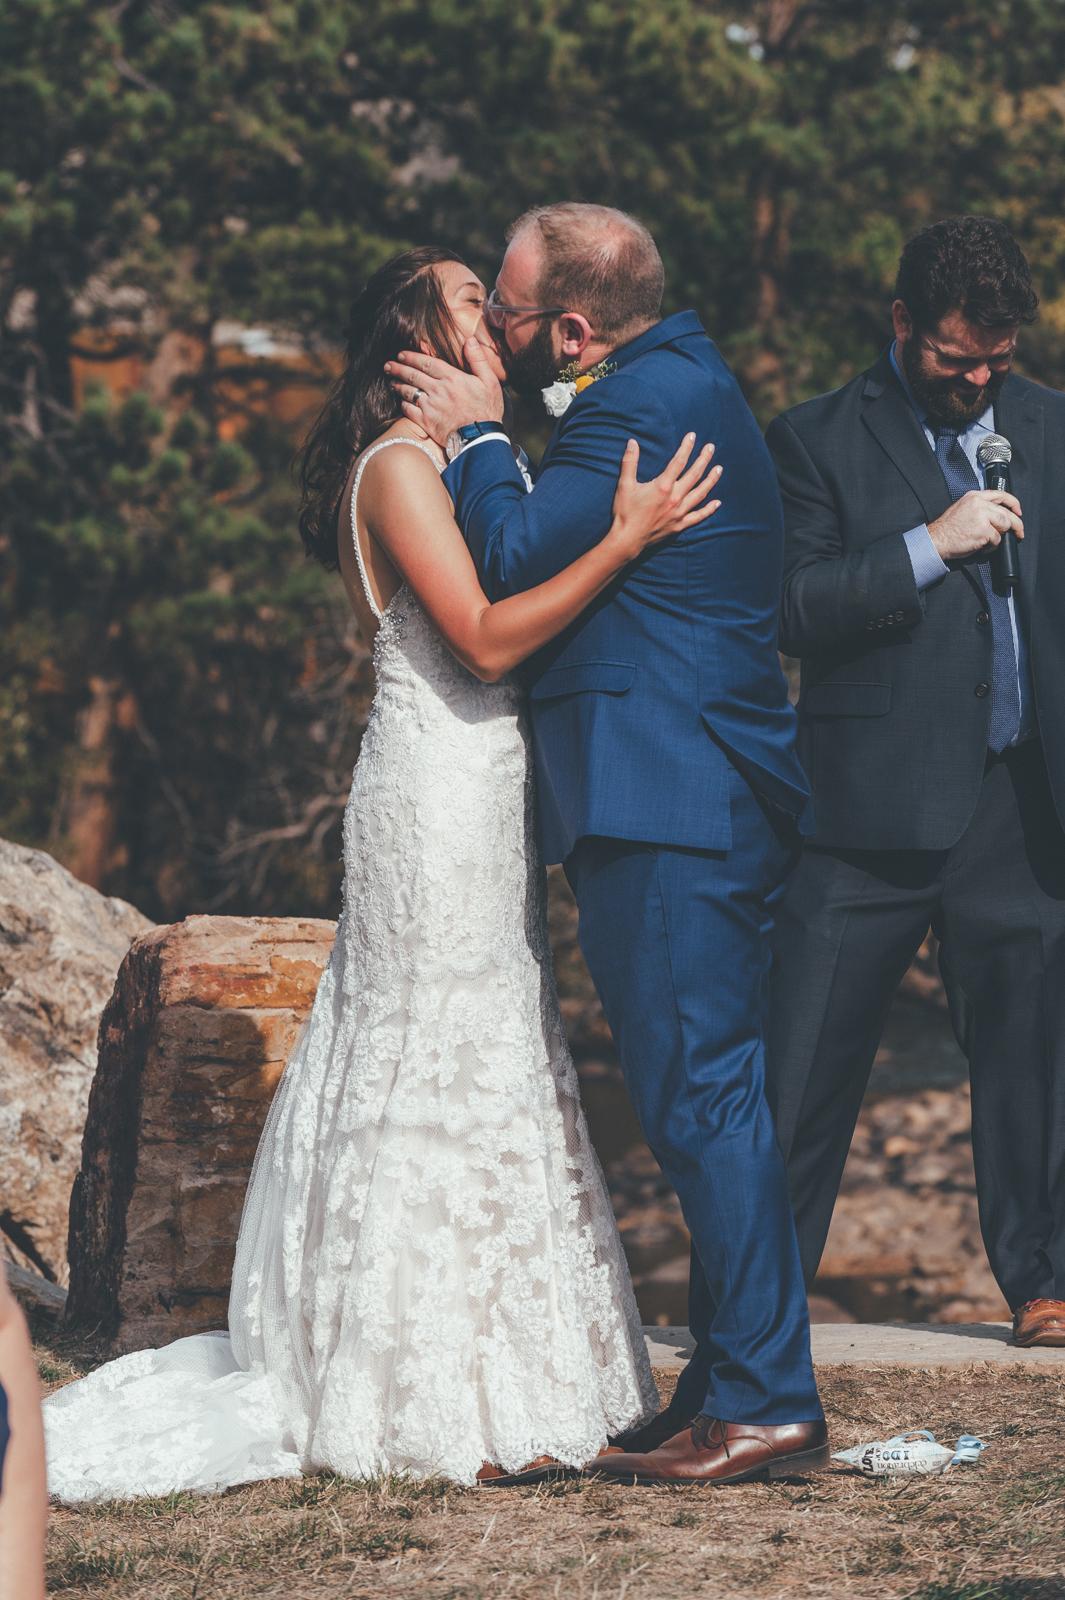 ChadFahnestockPhotography-estes-park-wedding-photography-027.jpg